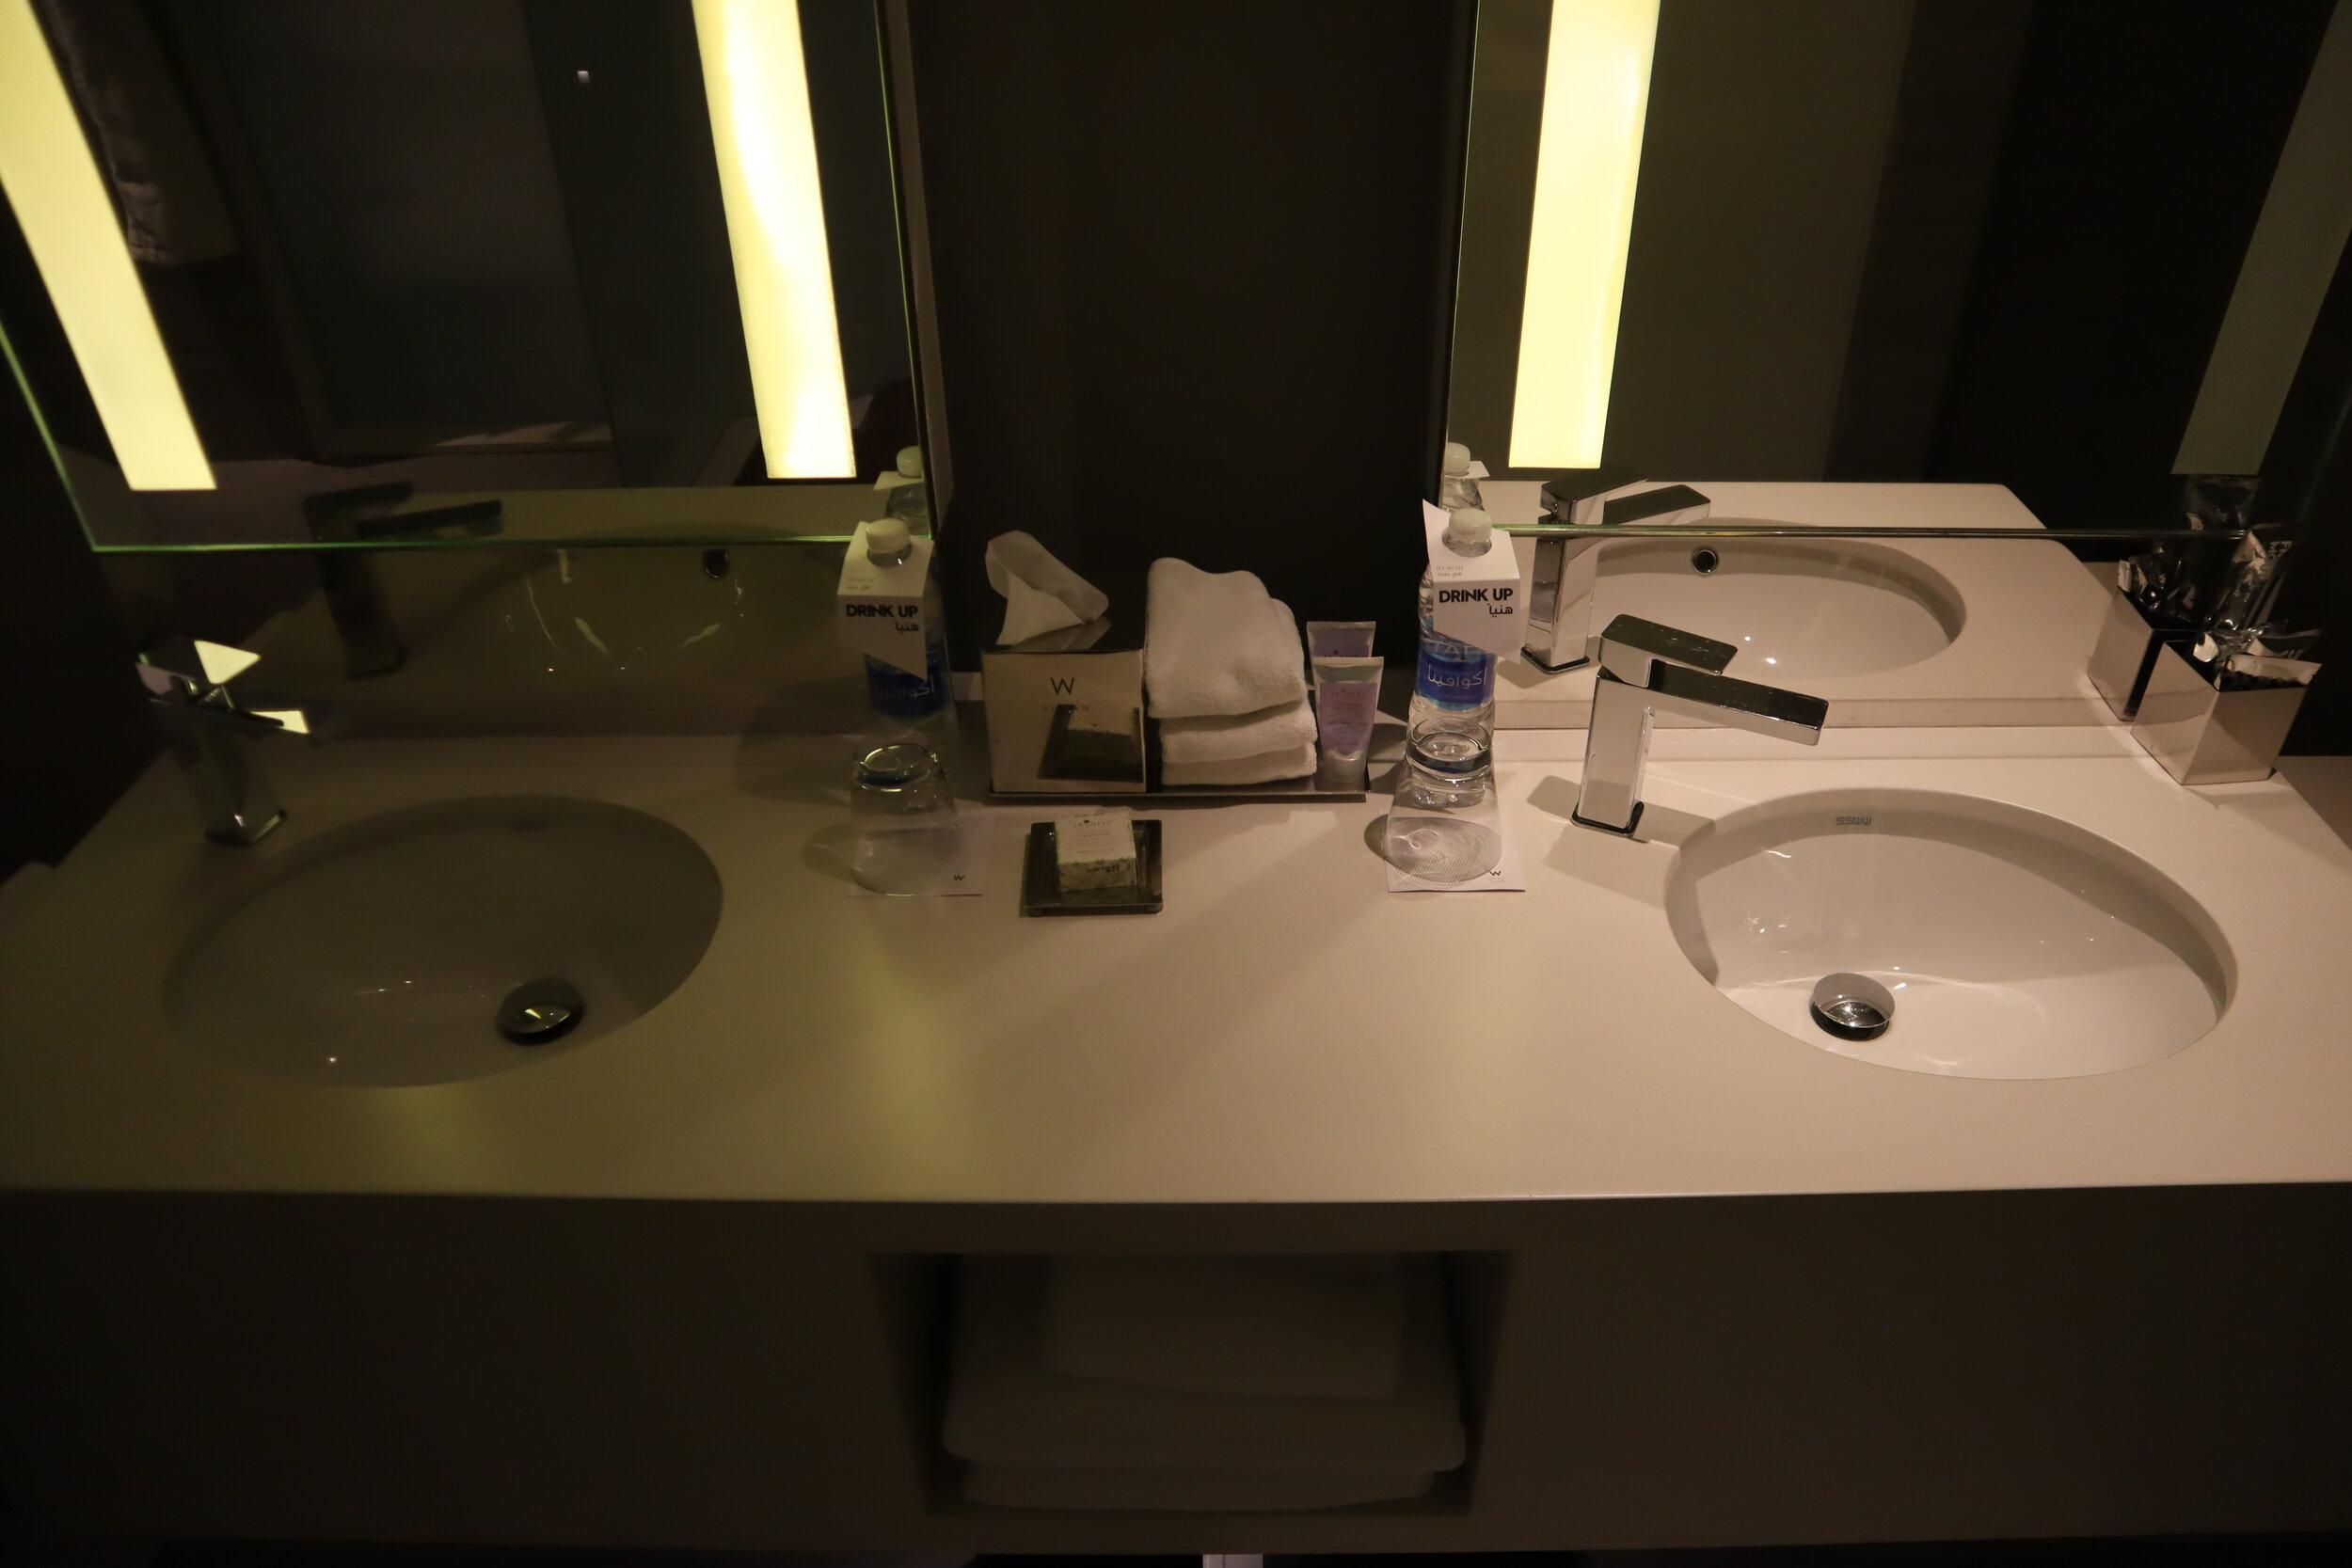 W Amman – Cool Corner Suite sinks